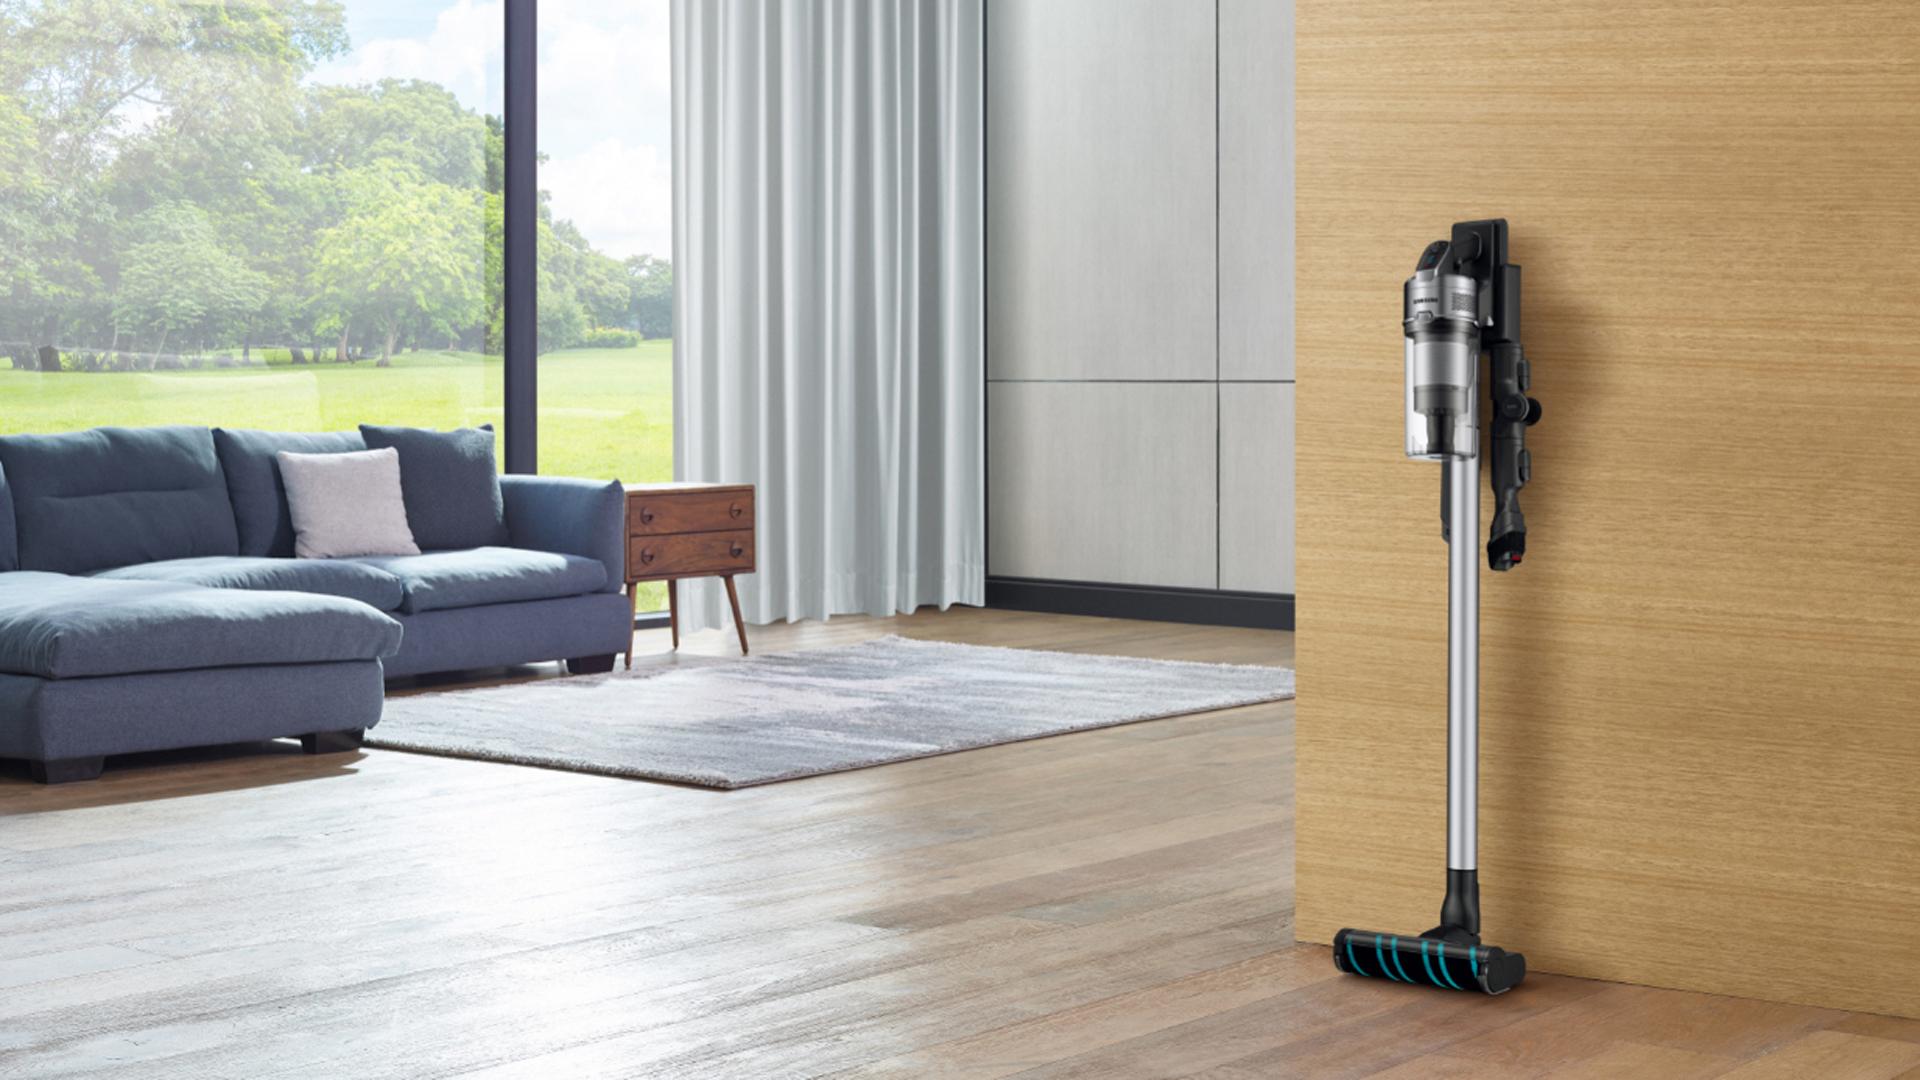 Best cordless vacuum cleaner 2020: the best cordless vacuums